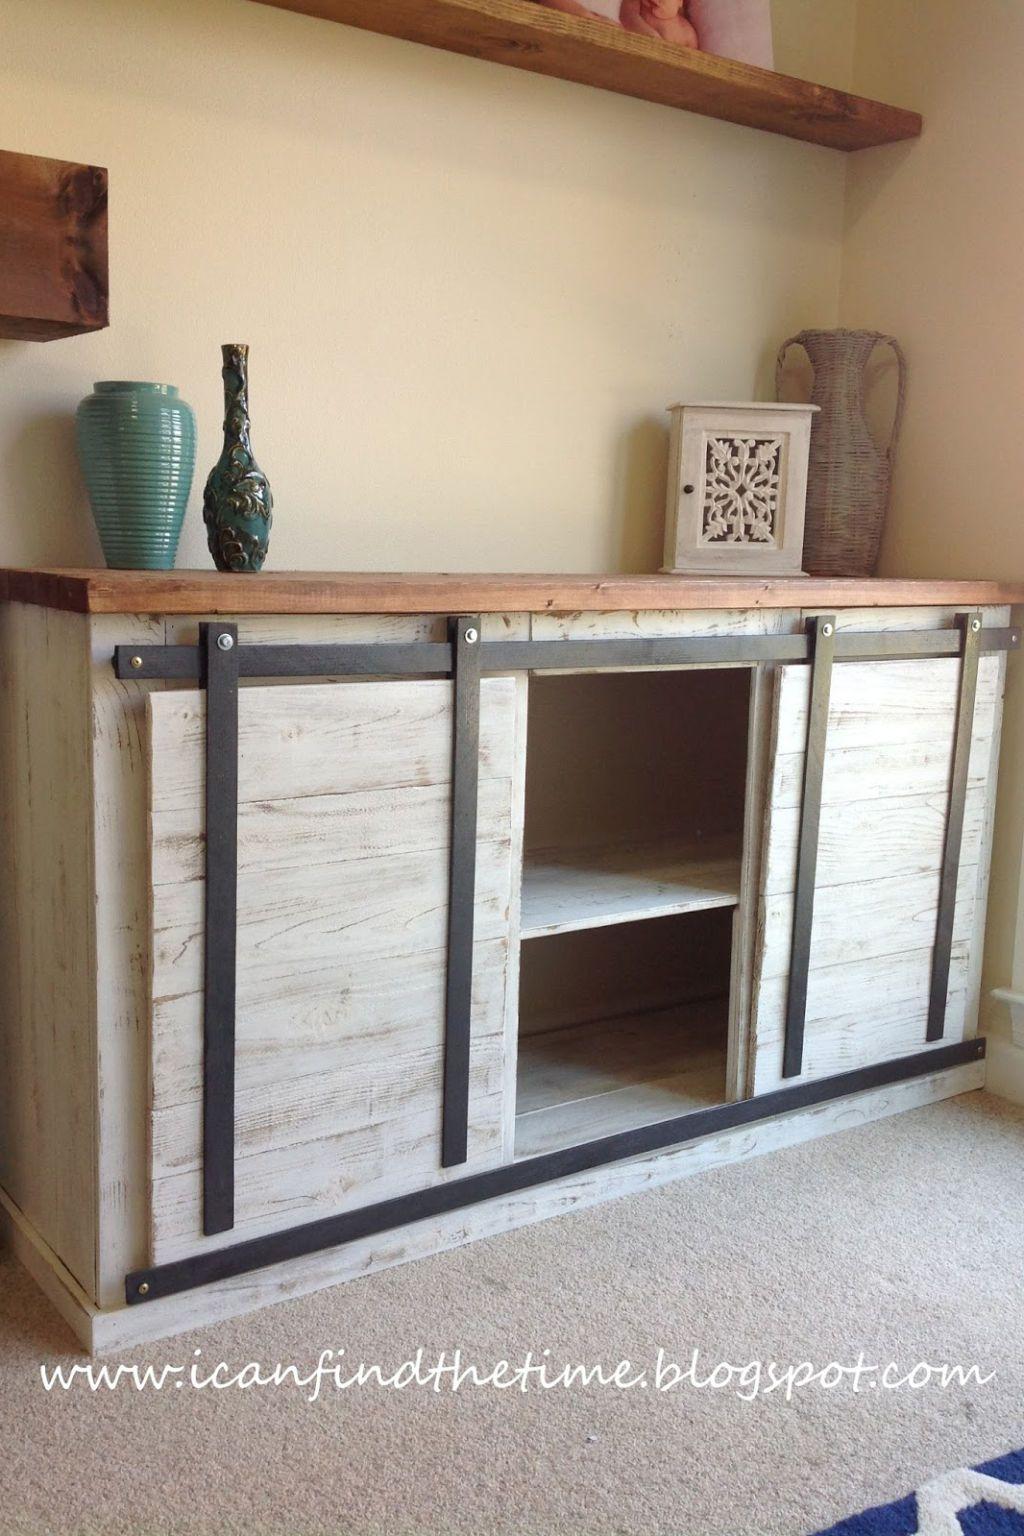 21 Fresh Ways To Incorporate Barn Doors Into Your Home Mobilier De Salon Decoration Interieure Deco Maison